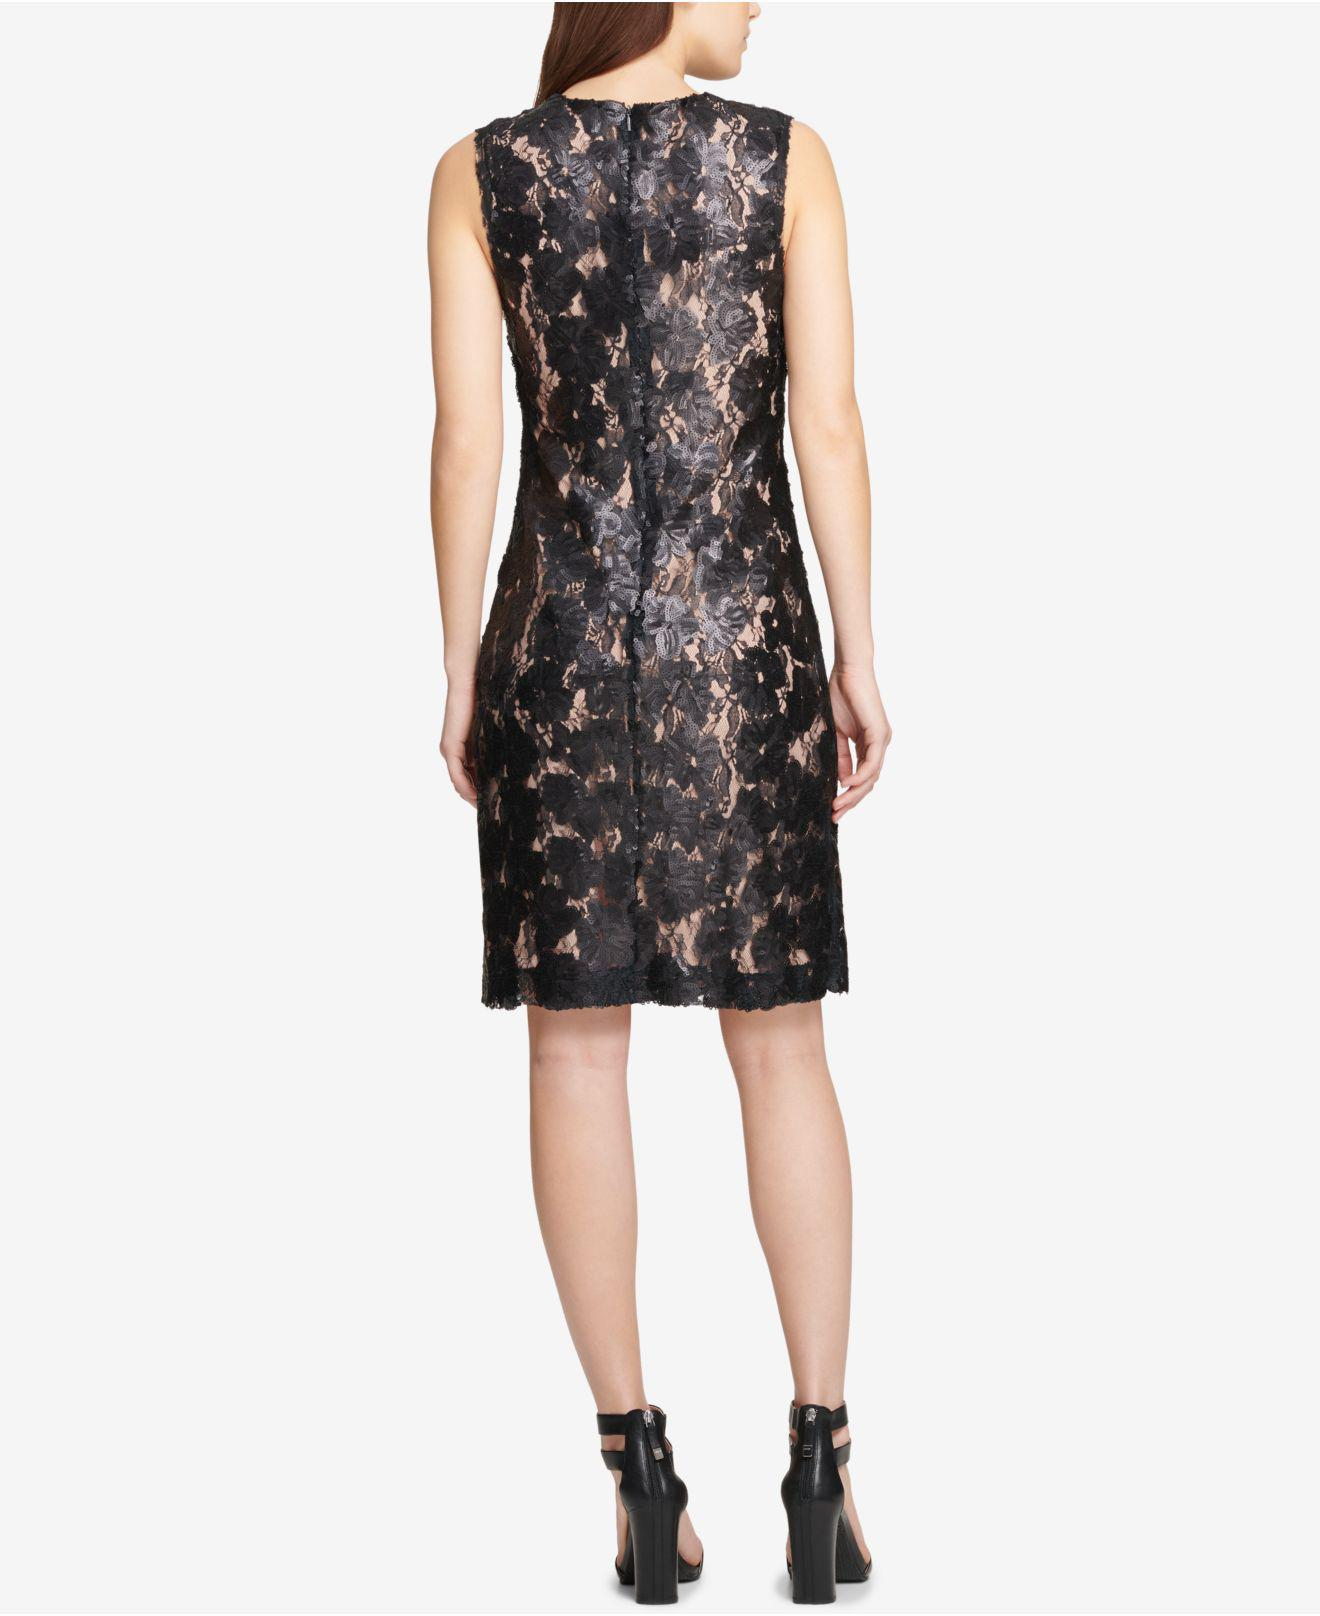 Lyst Dkny Sequinned Lace Sheath Dress Created For Macys